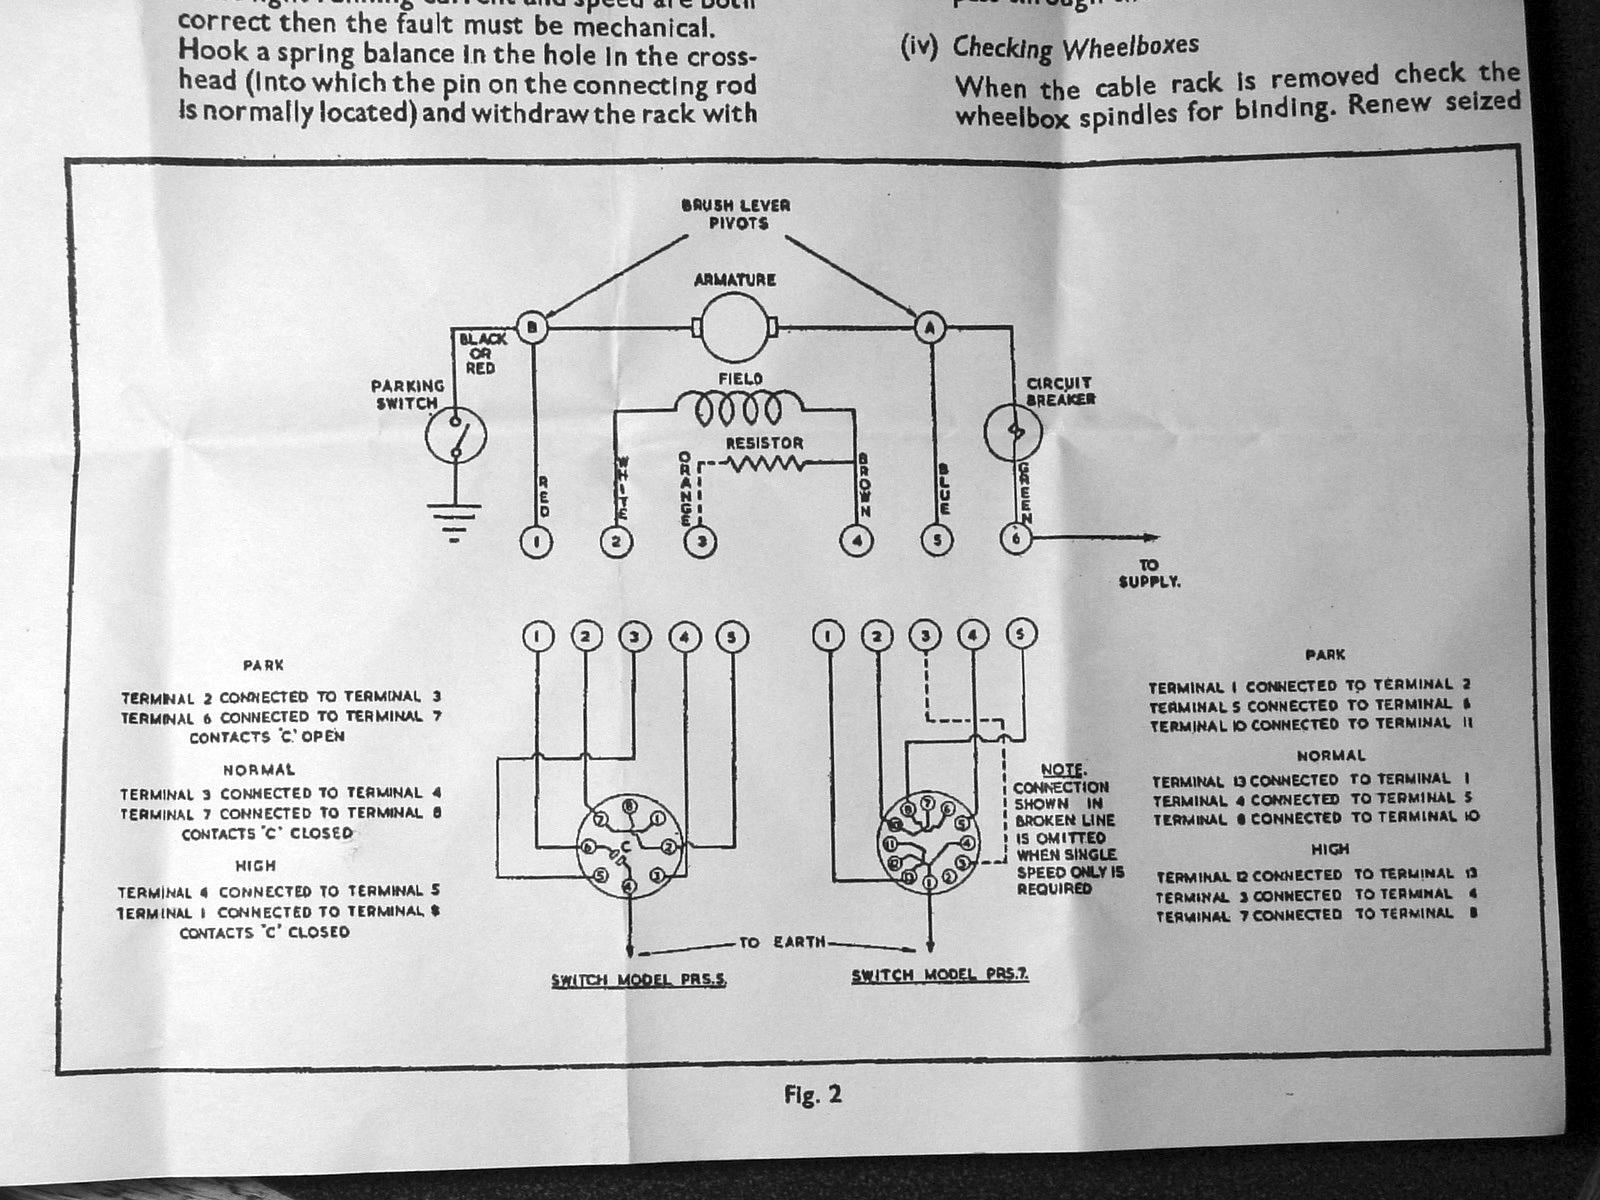 s10 wiper motor wiring diagram king kutter tiller parts 83 chevy get free image